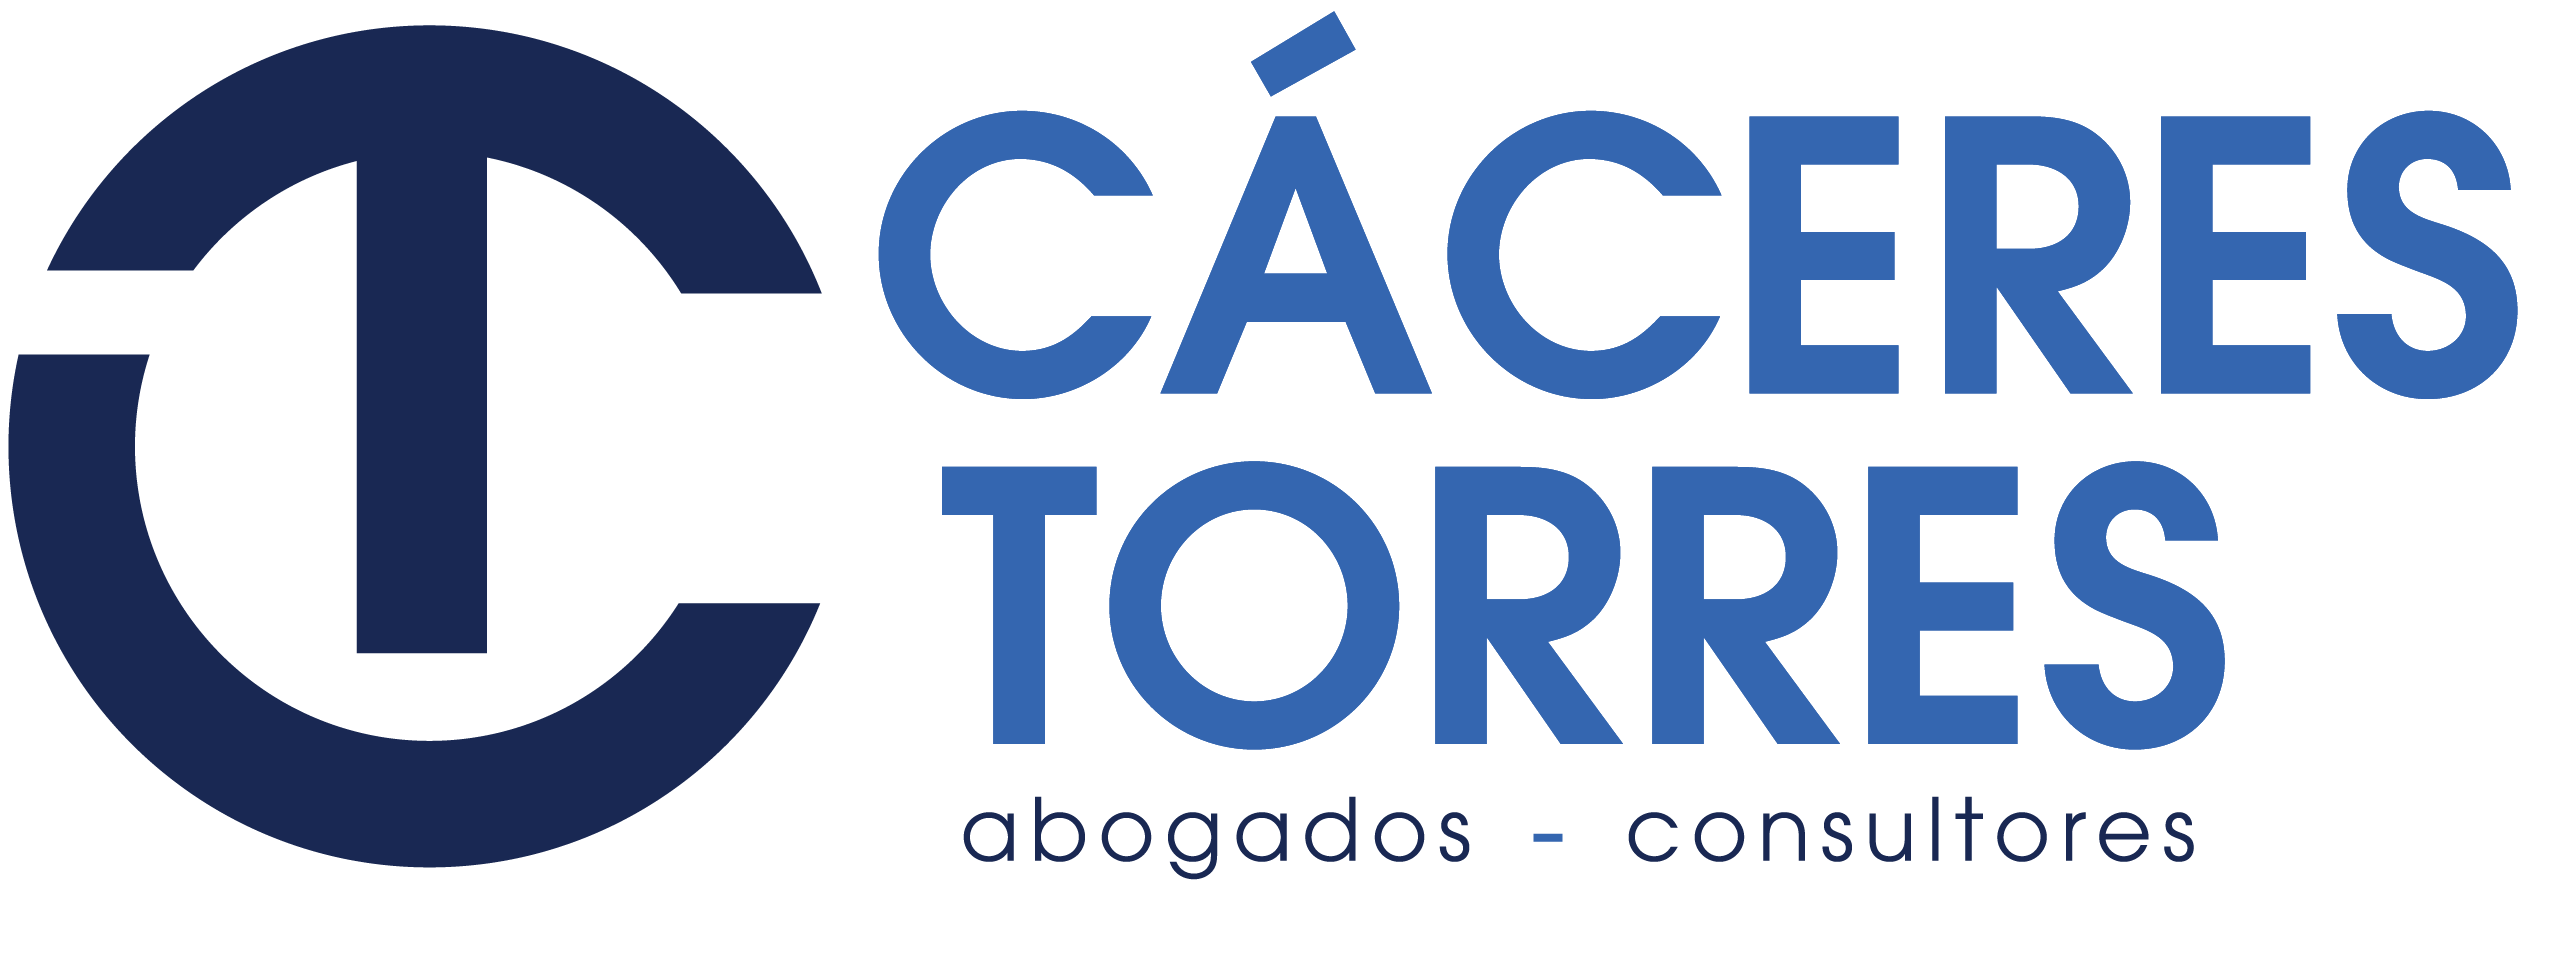 Caceres Torres logo